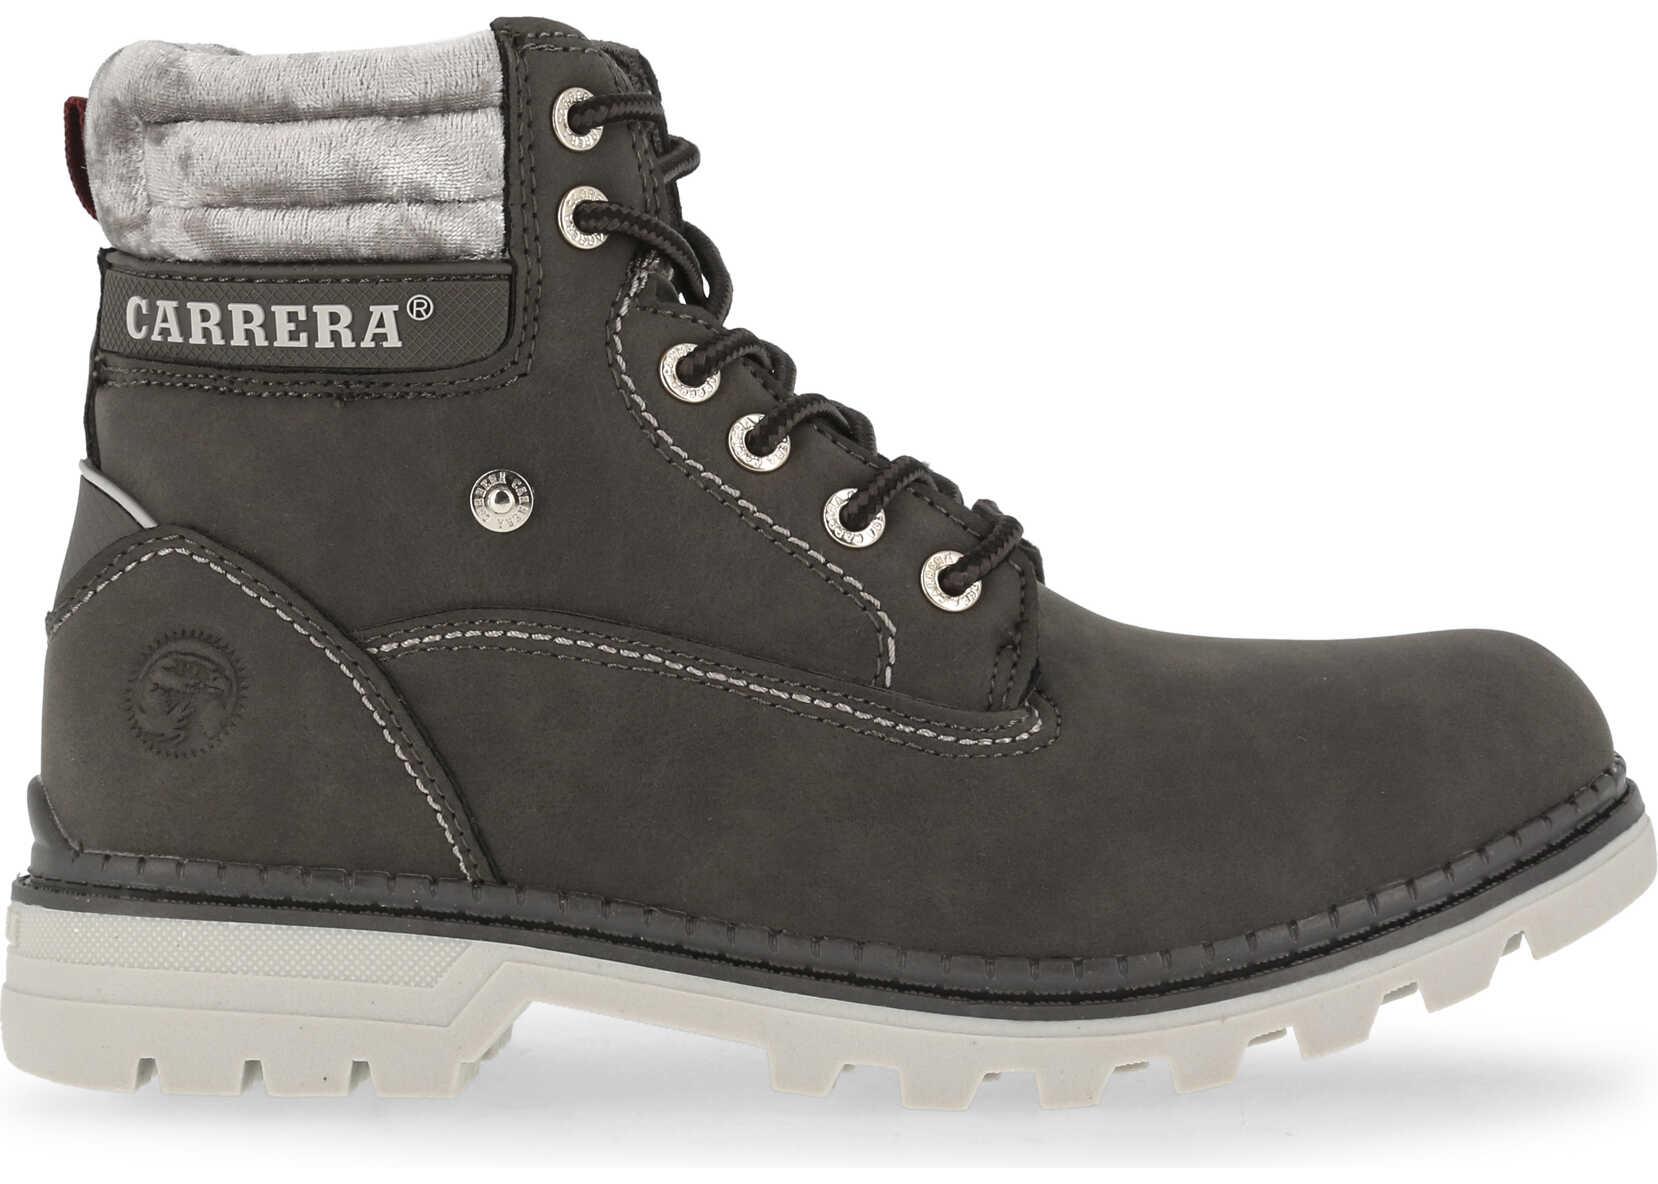 Carrera Jeans Tennesse_Caw721001 GREY